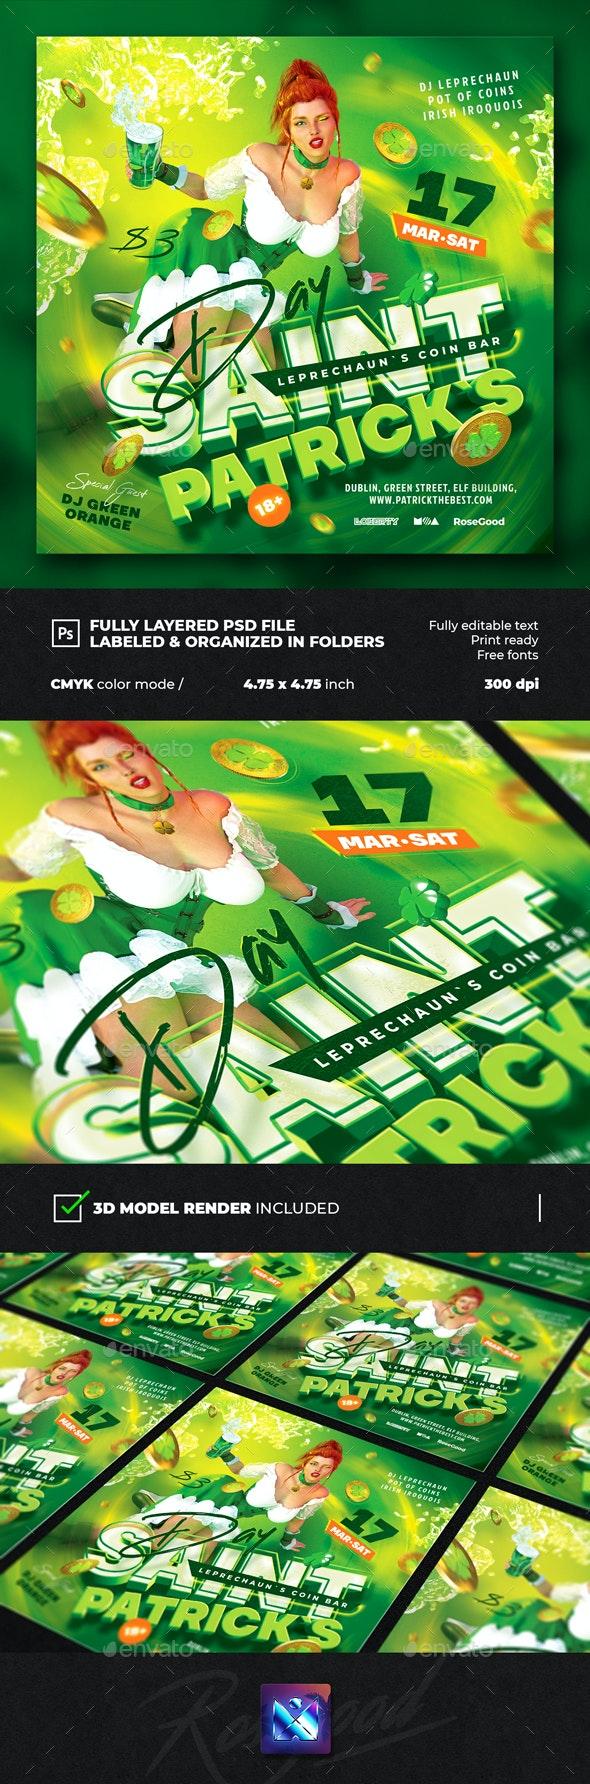 Saint Patricks Day Party Flyer - Events Flyers